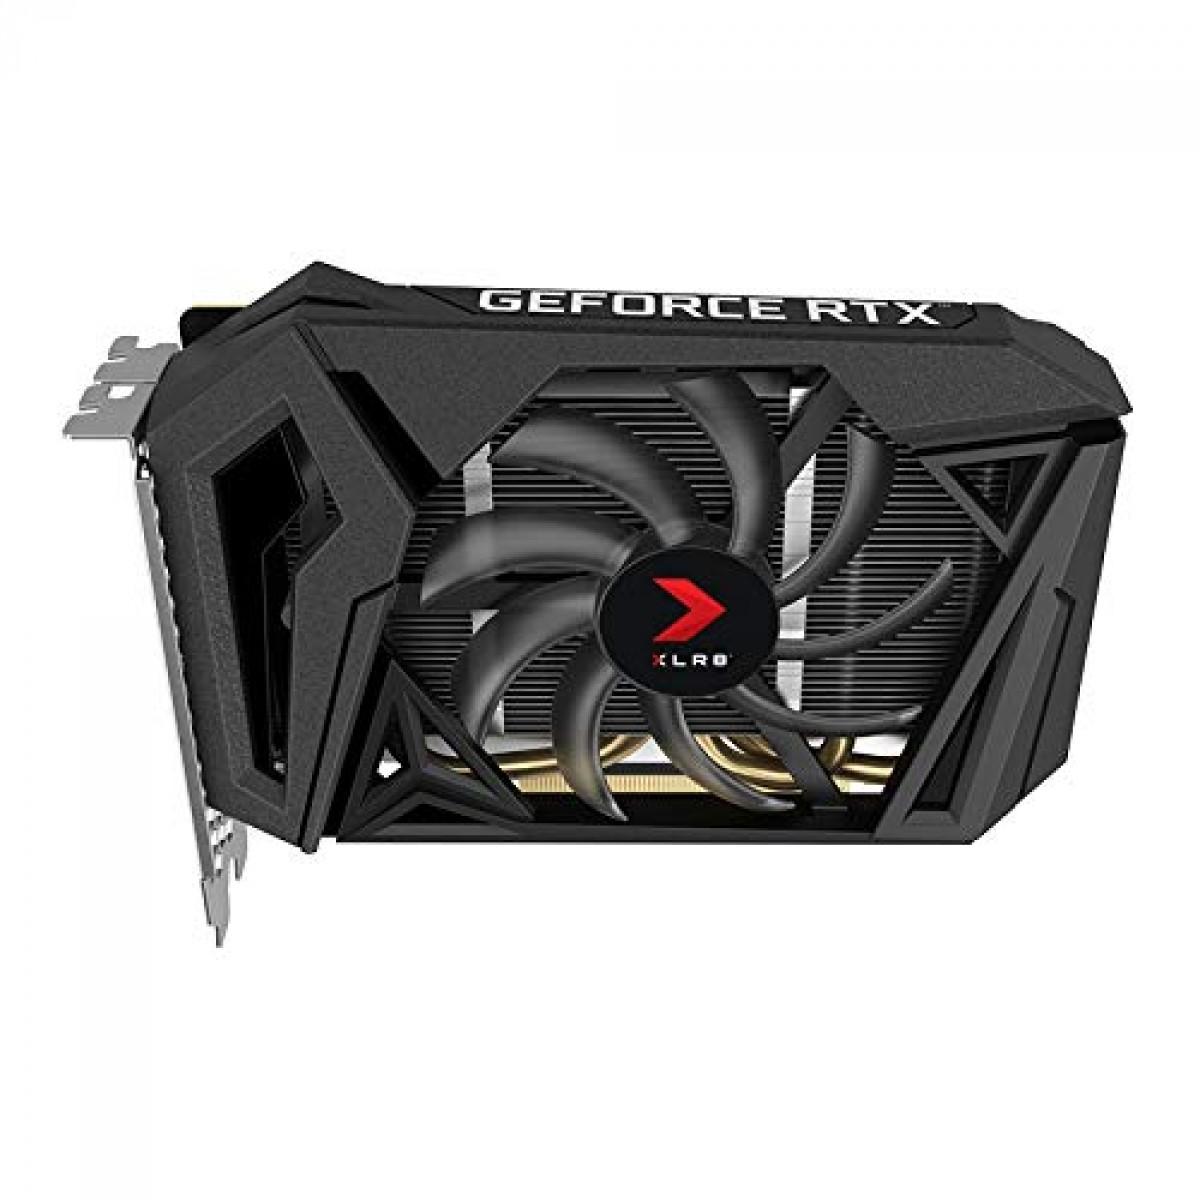 Placa de Vídeo PNY Geforce RTX 2060 XLR8 Gaming Overclocked Edition 6GB GDDR6, 192Bit, KMR2060N3J6EW1AKTP